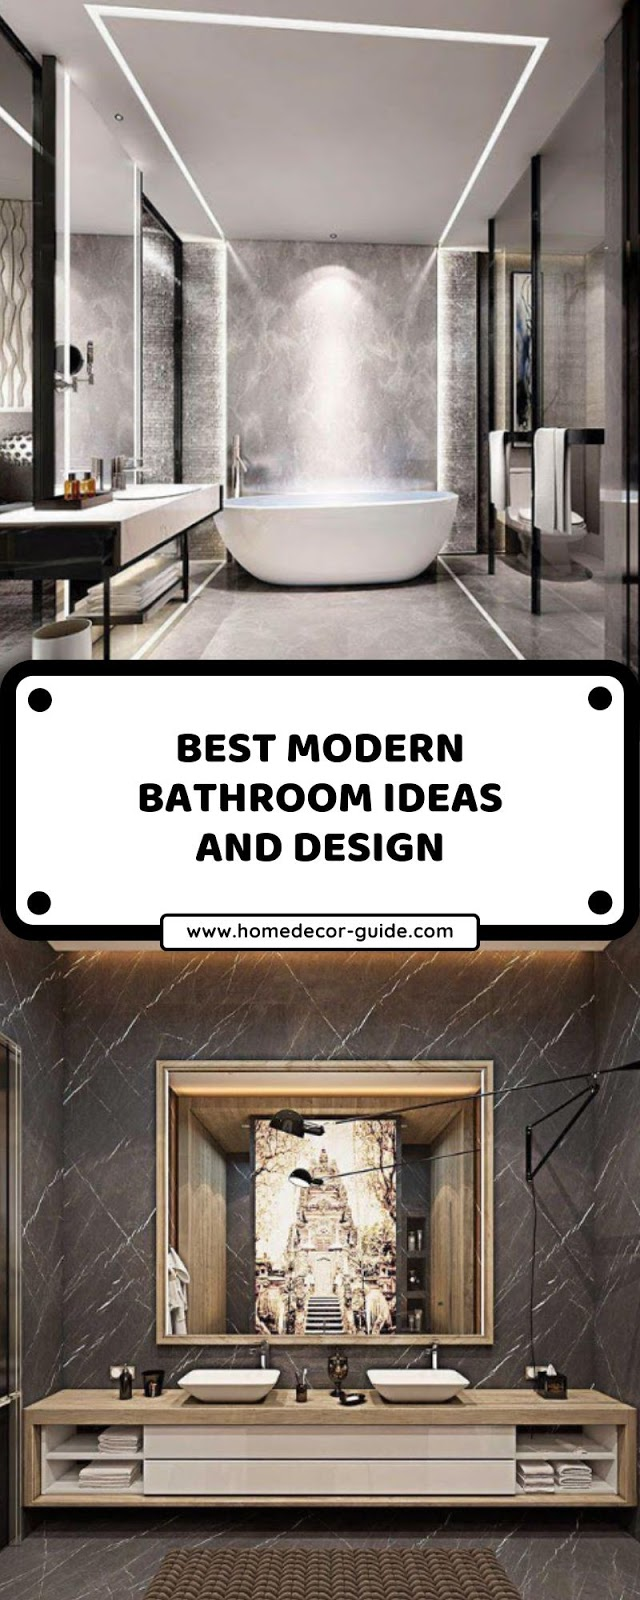 BEST MODERN BATHROOM IDEAS AND DESIGN